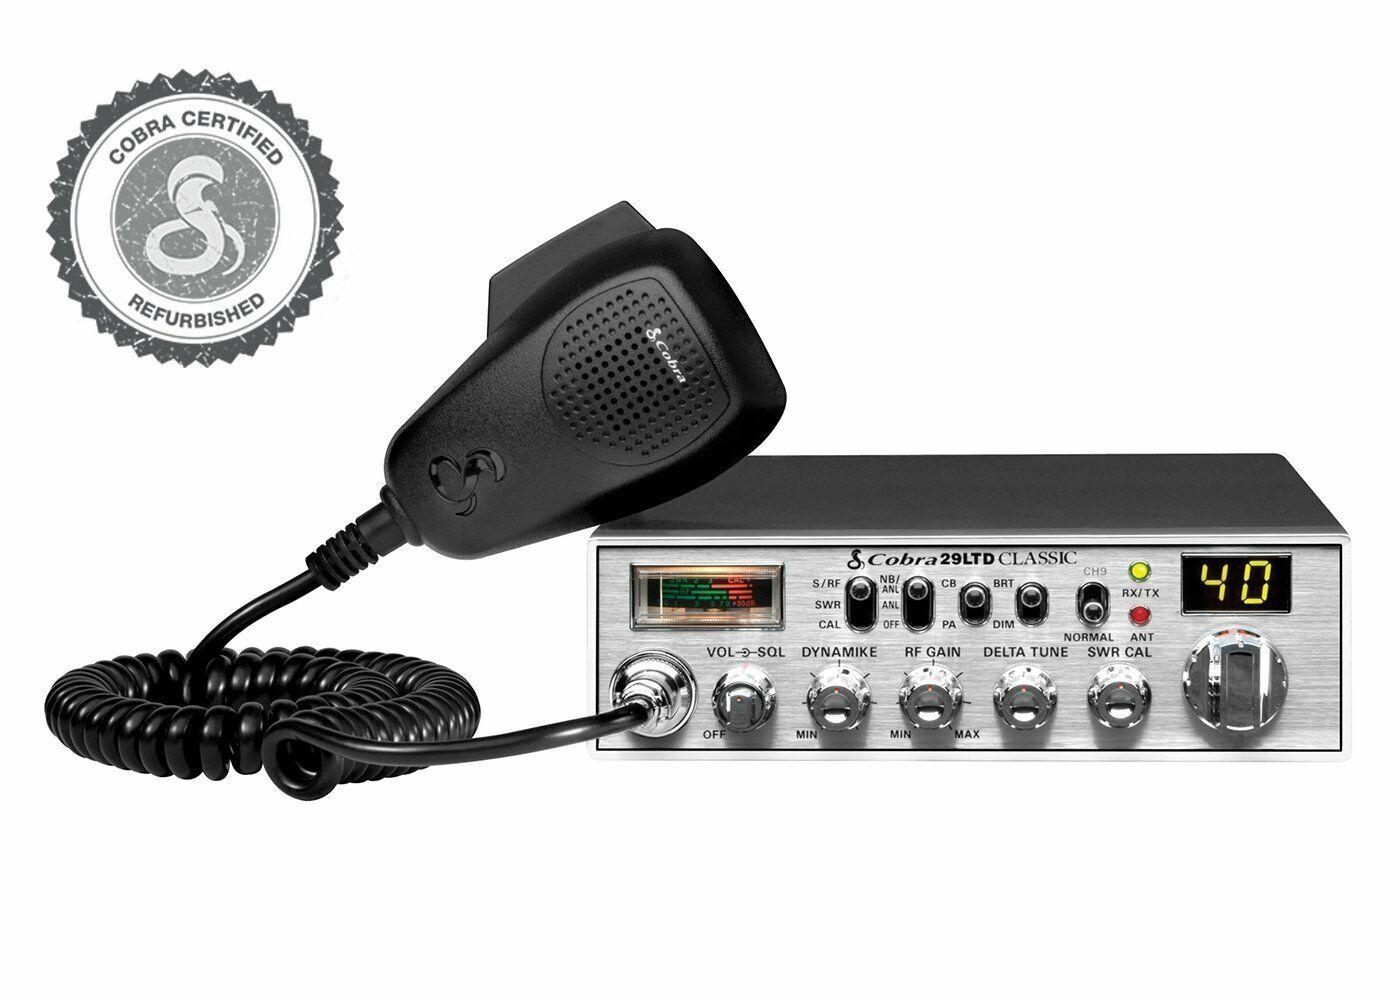 29 LTD FR cobraelectronics Cobra Electronics 29 LTD Certified Refurbished Professional CB Radio